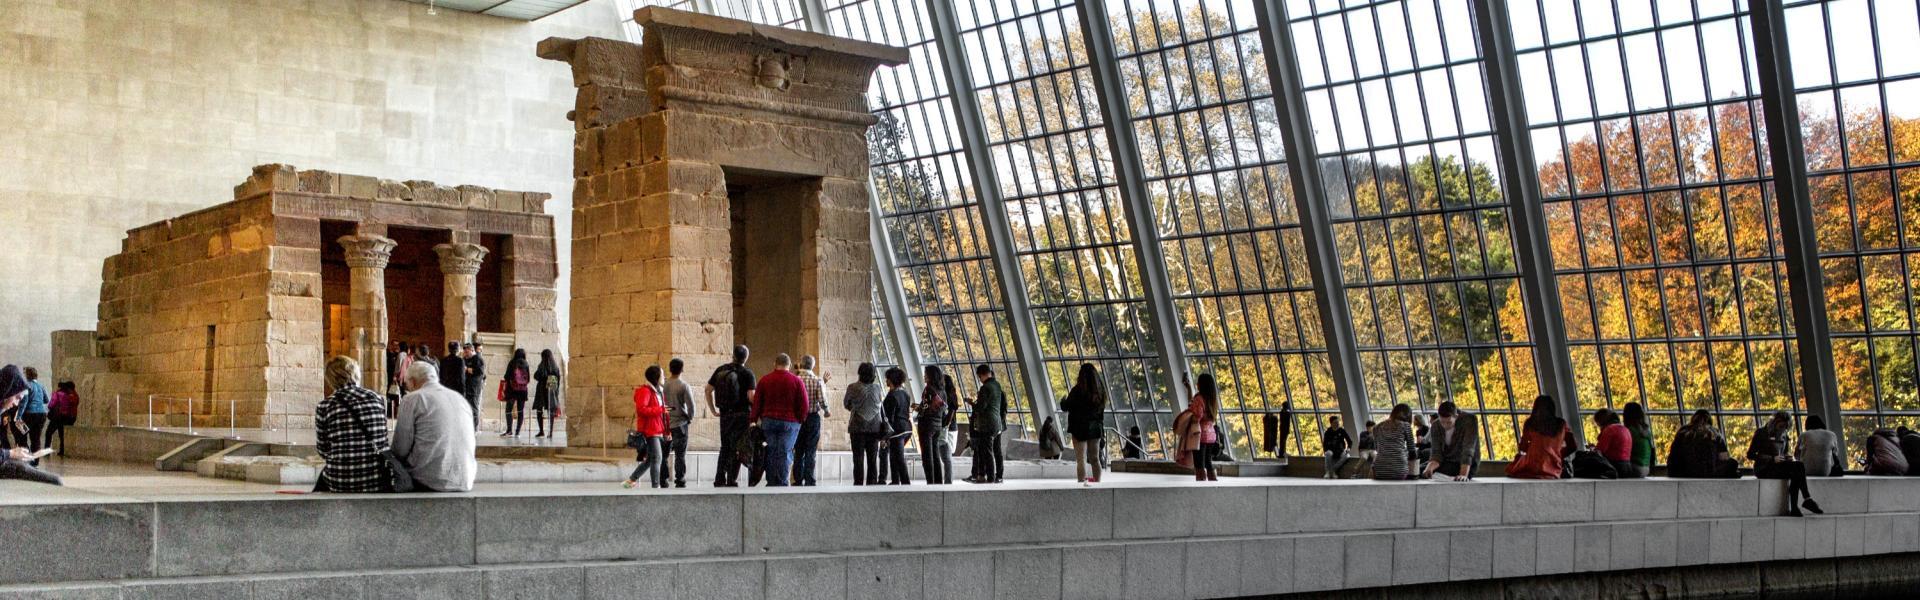 HeaderCrop-Temple-of-Dendur-Metropolitan-Museum-of-Art-Brittany-Petronella_X9A7045